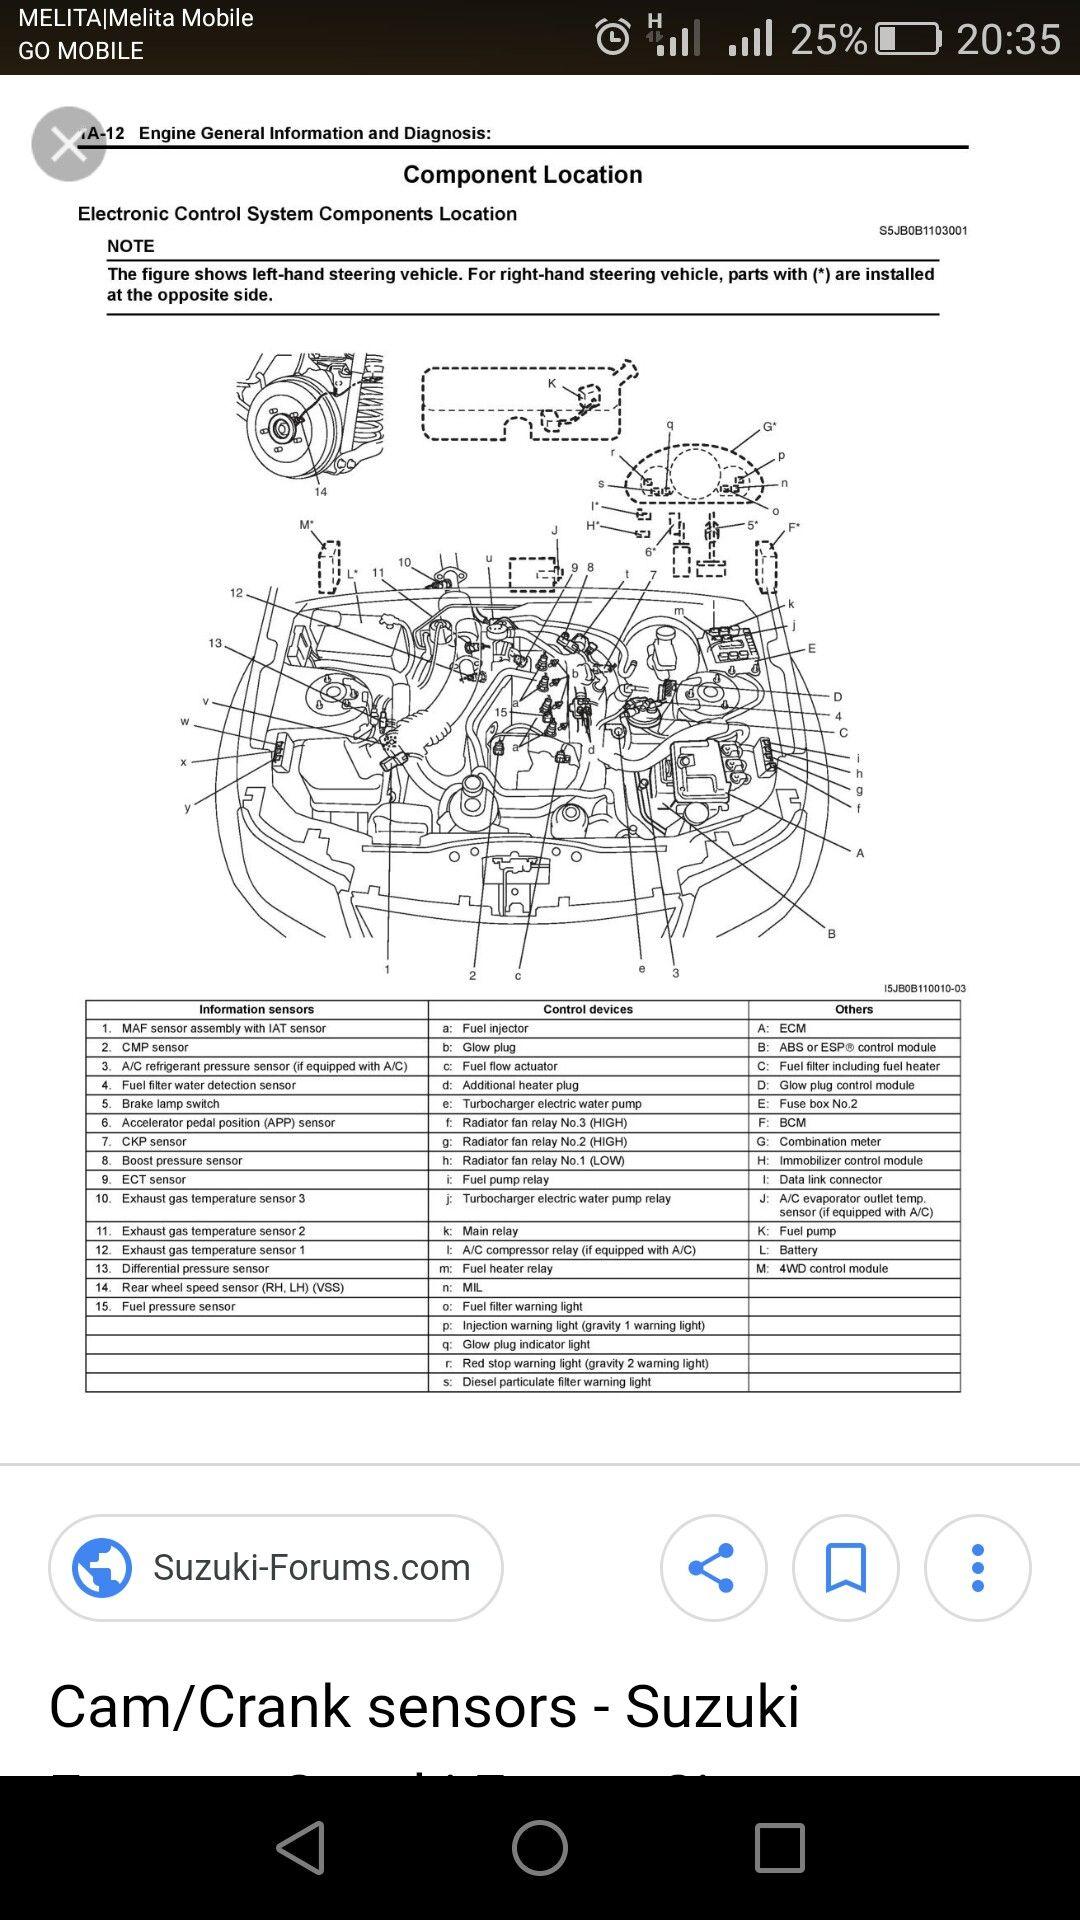 Suzuki Grand Vitara Glow Plug Relay Location